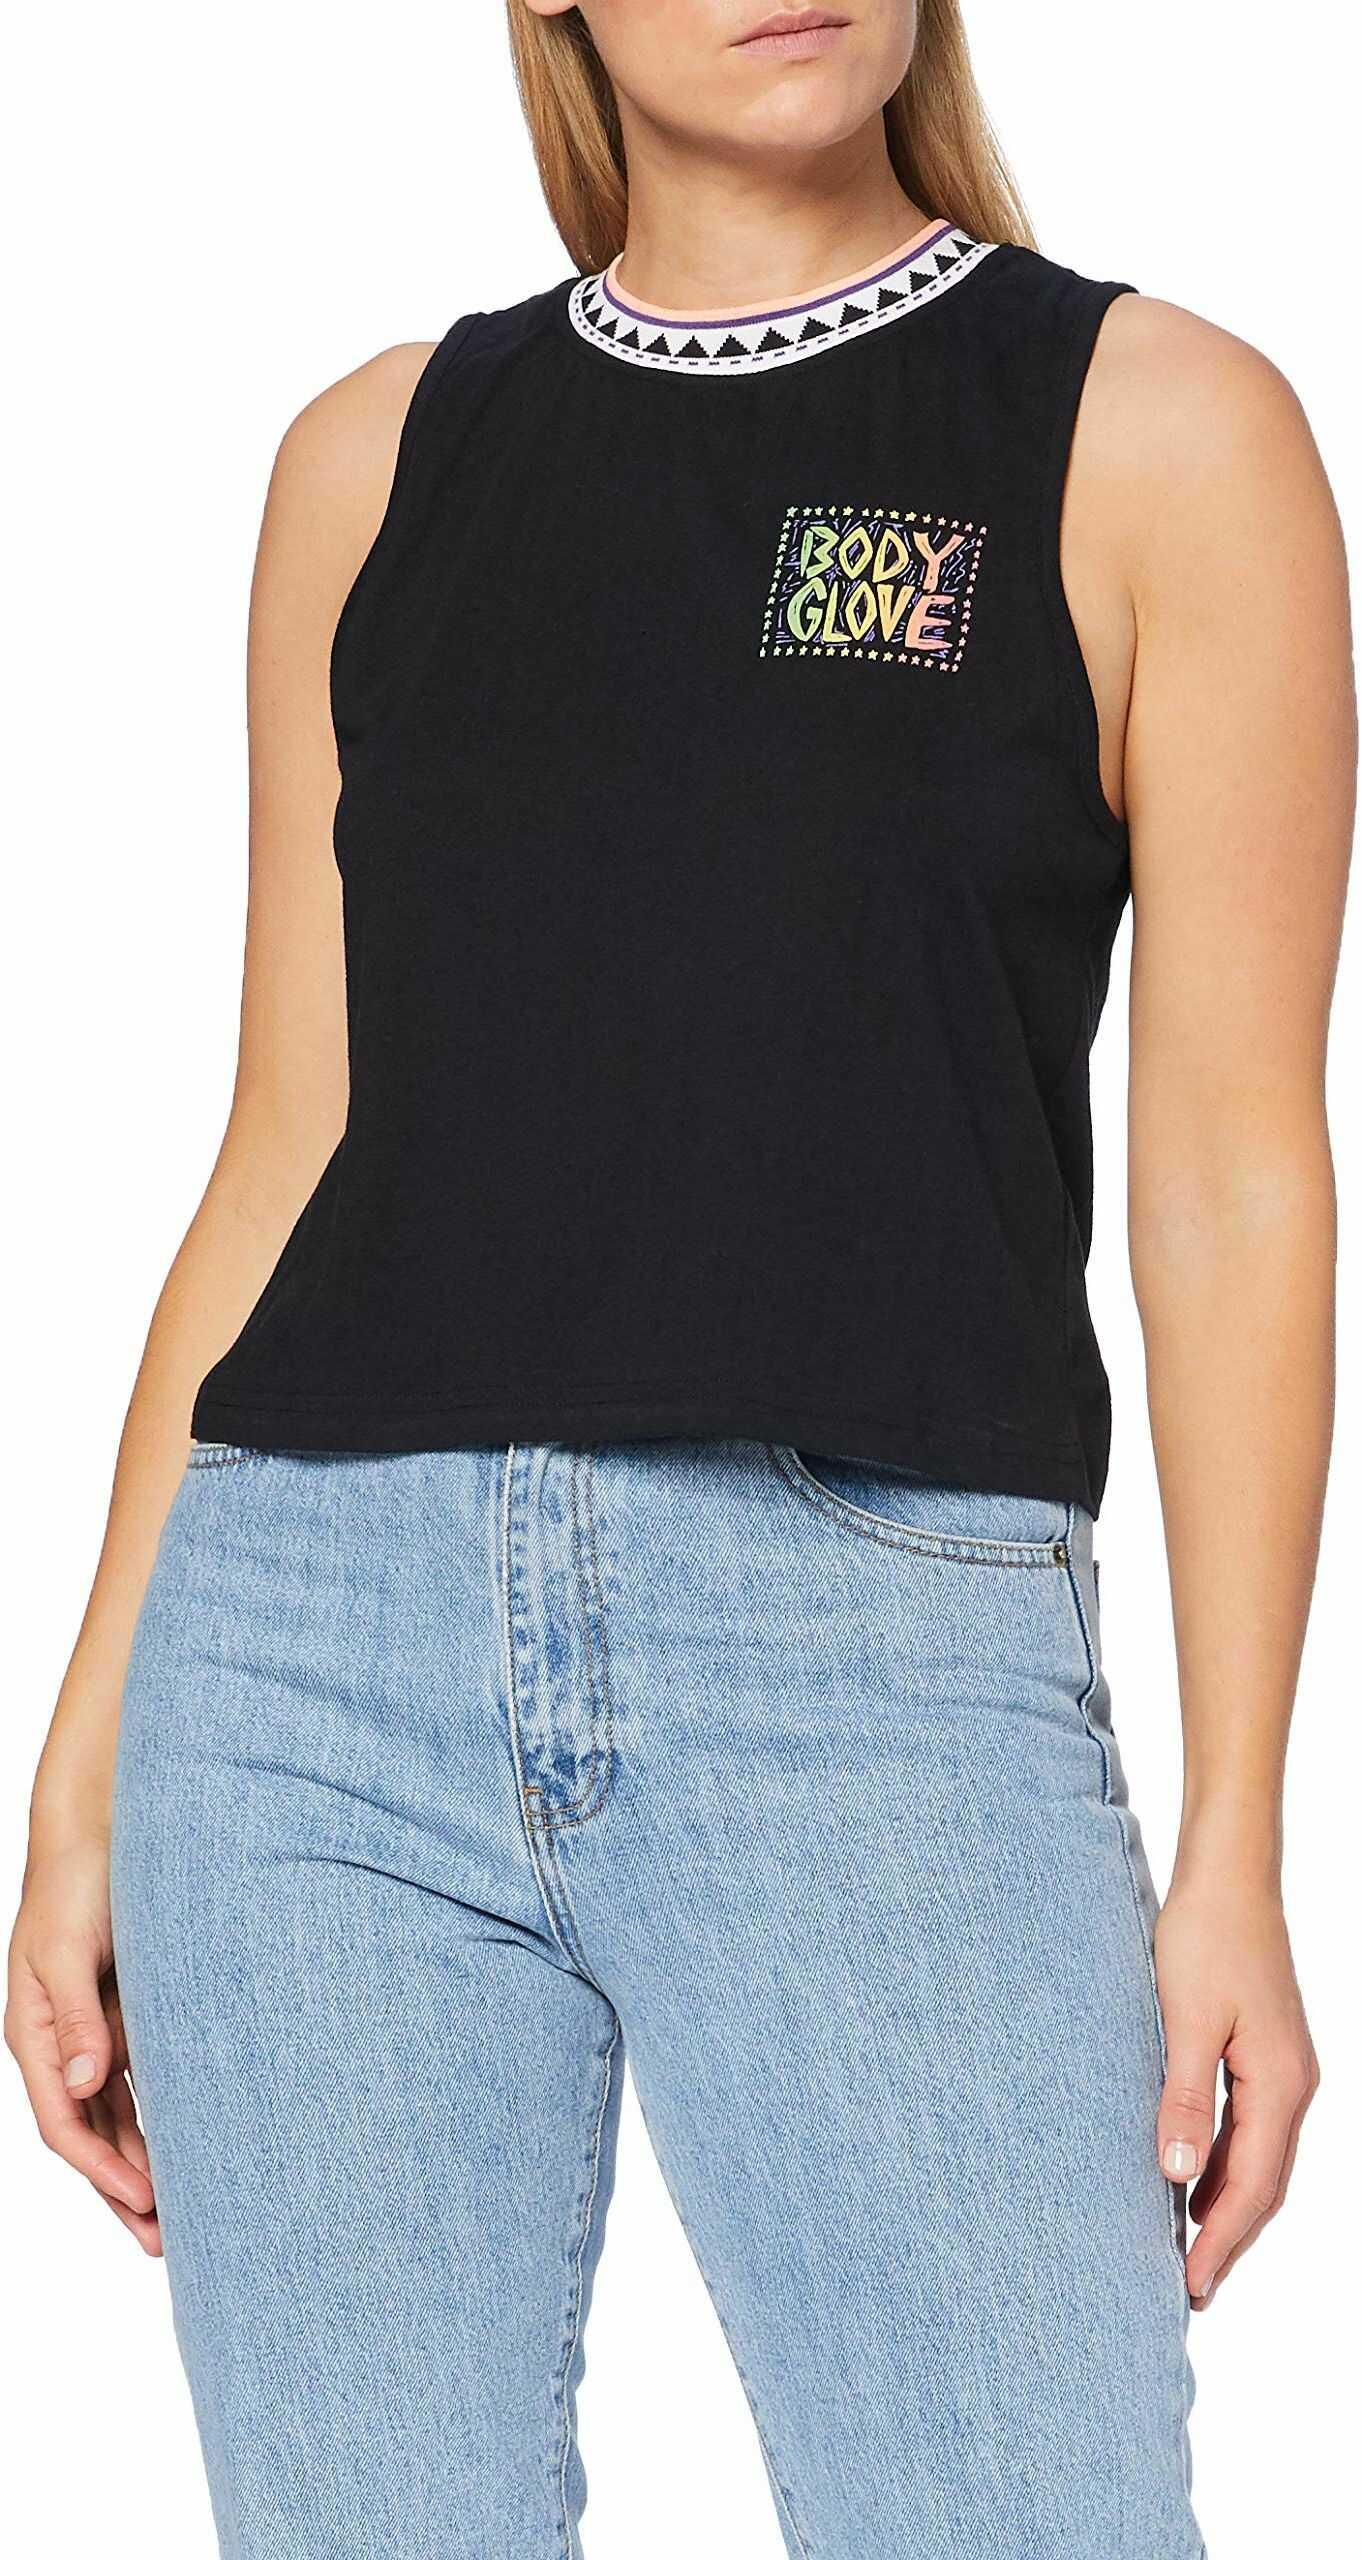 Body Glove Kamizelka damska Woodcut Vest, czarna, XS